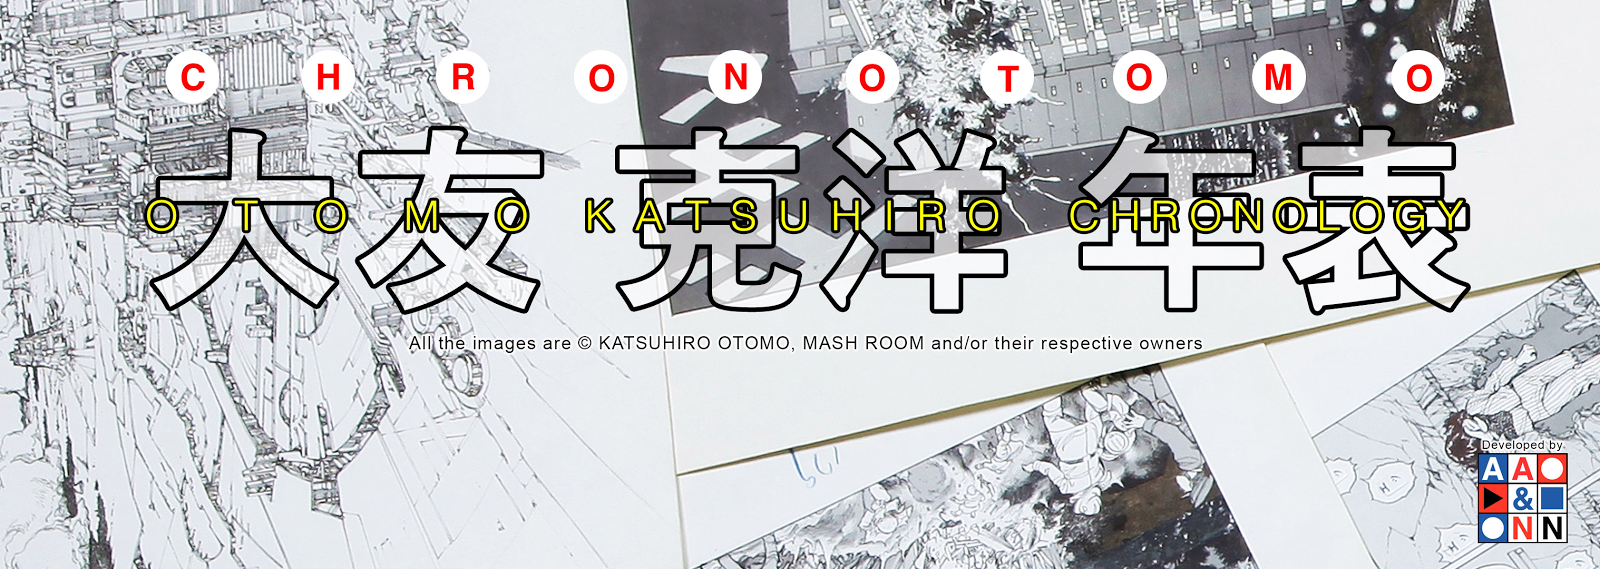 Katsuhiro Otomo 大友克洋 Chronology